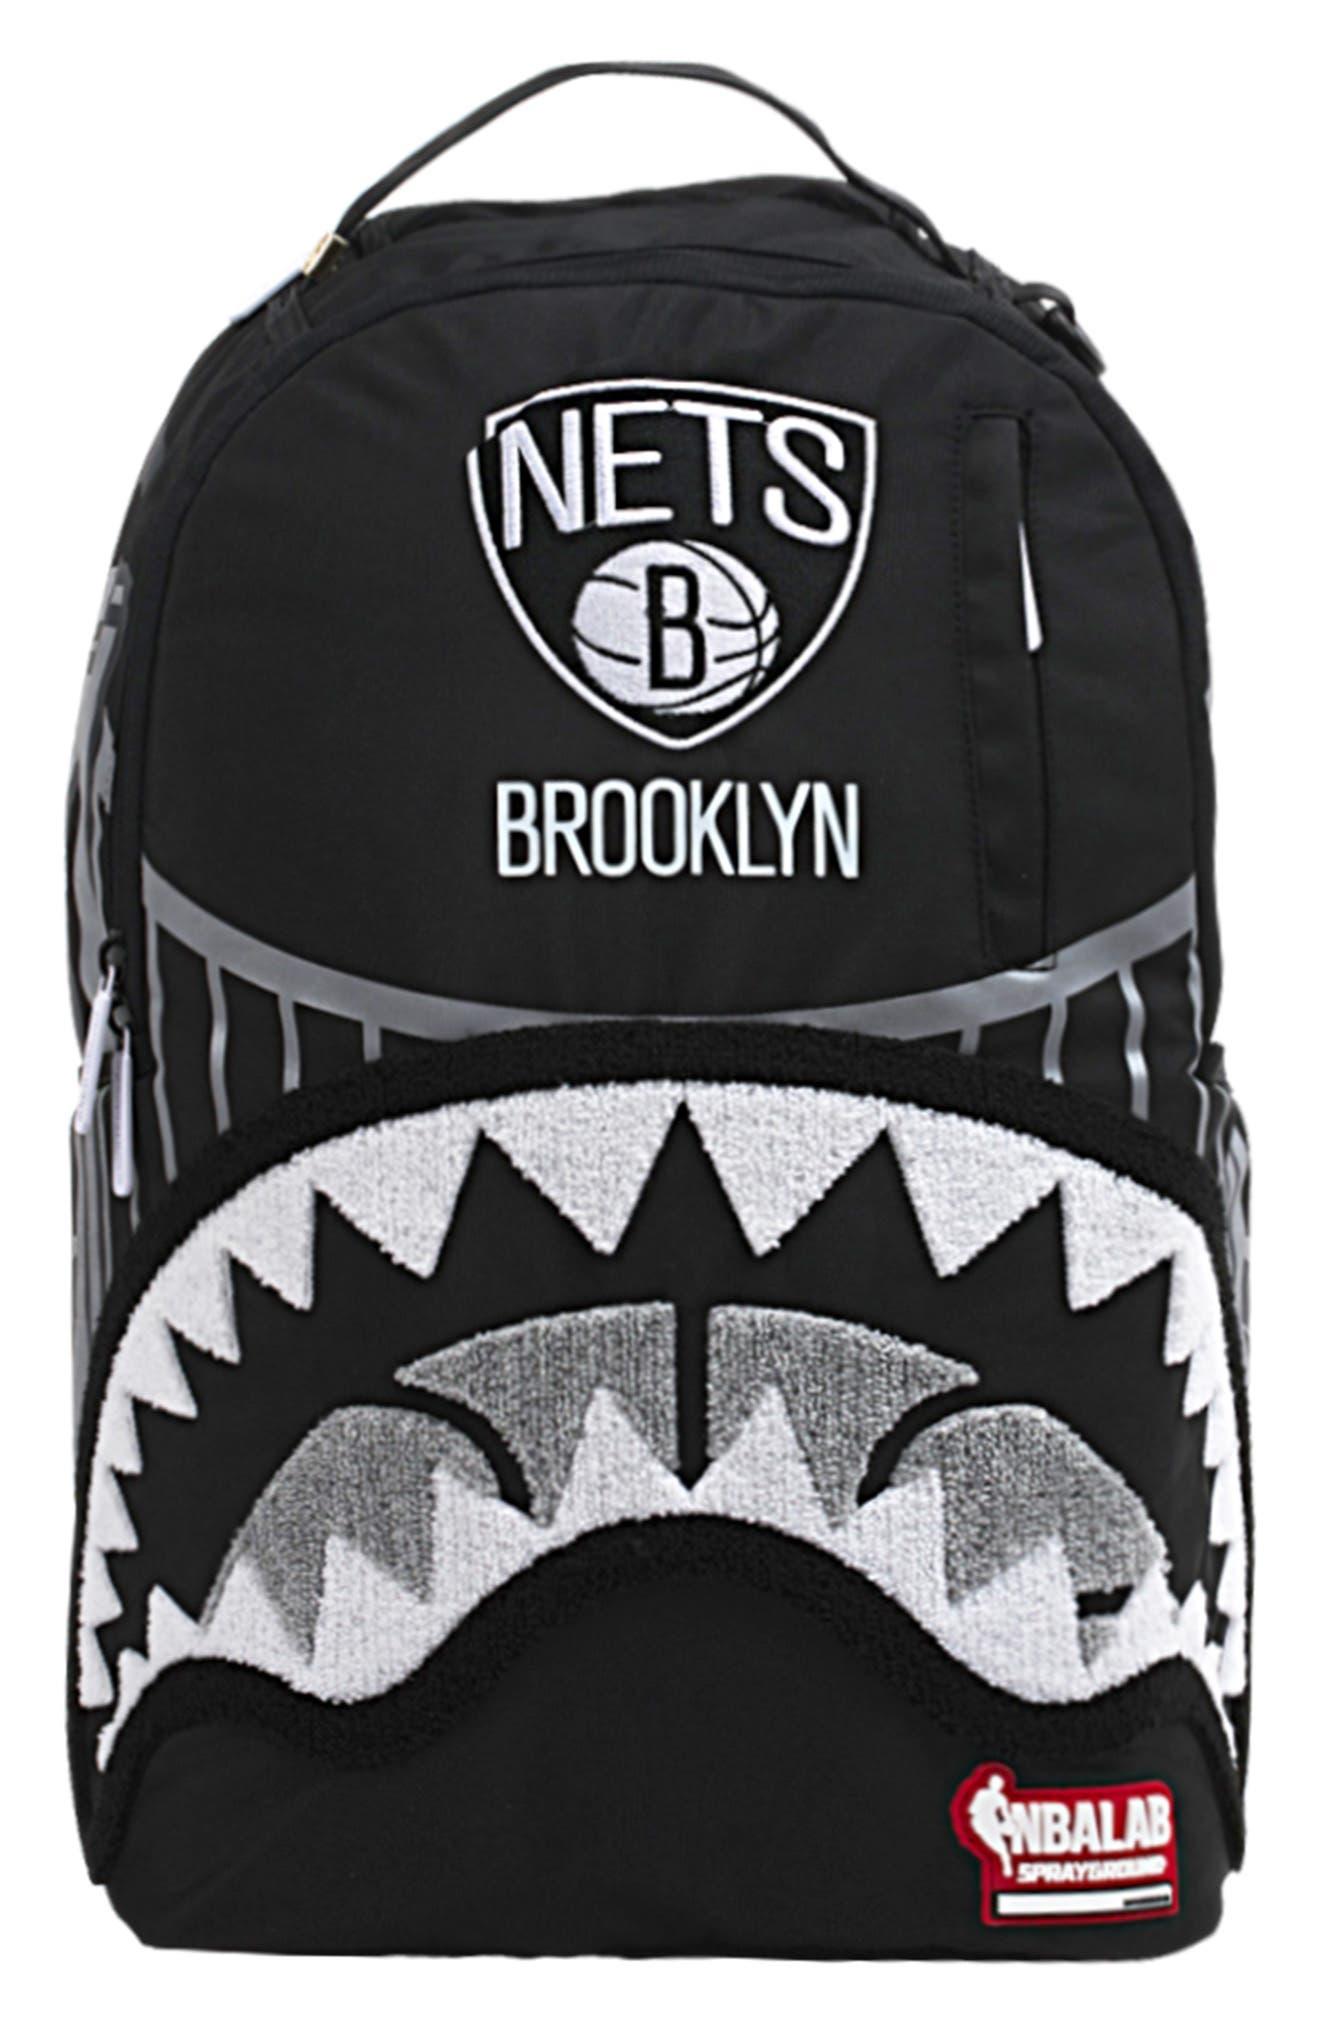 SPRAYGROUND Brooklyn Bridge Shark Teeth Backpack - Black